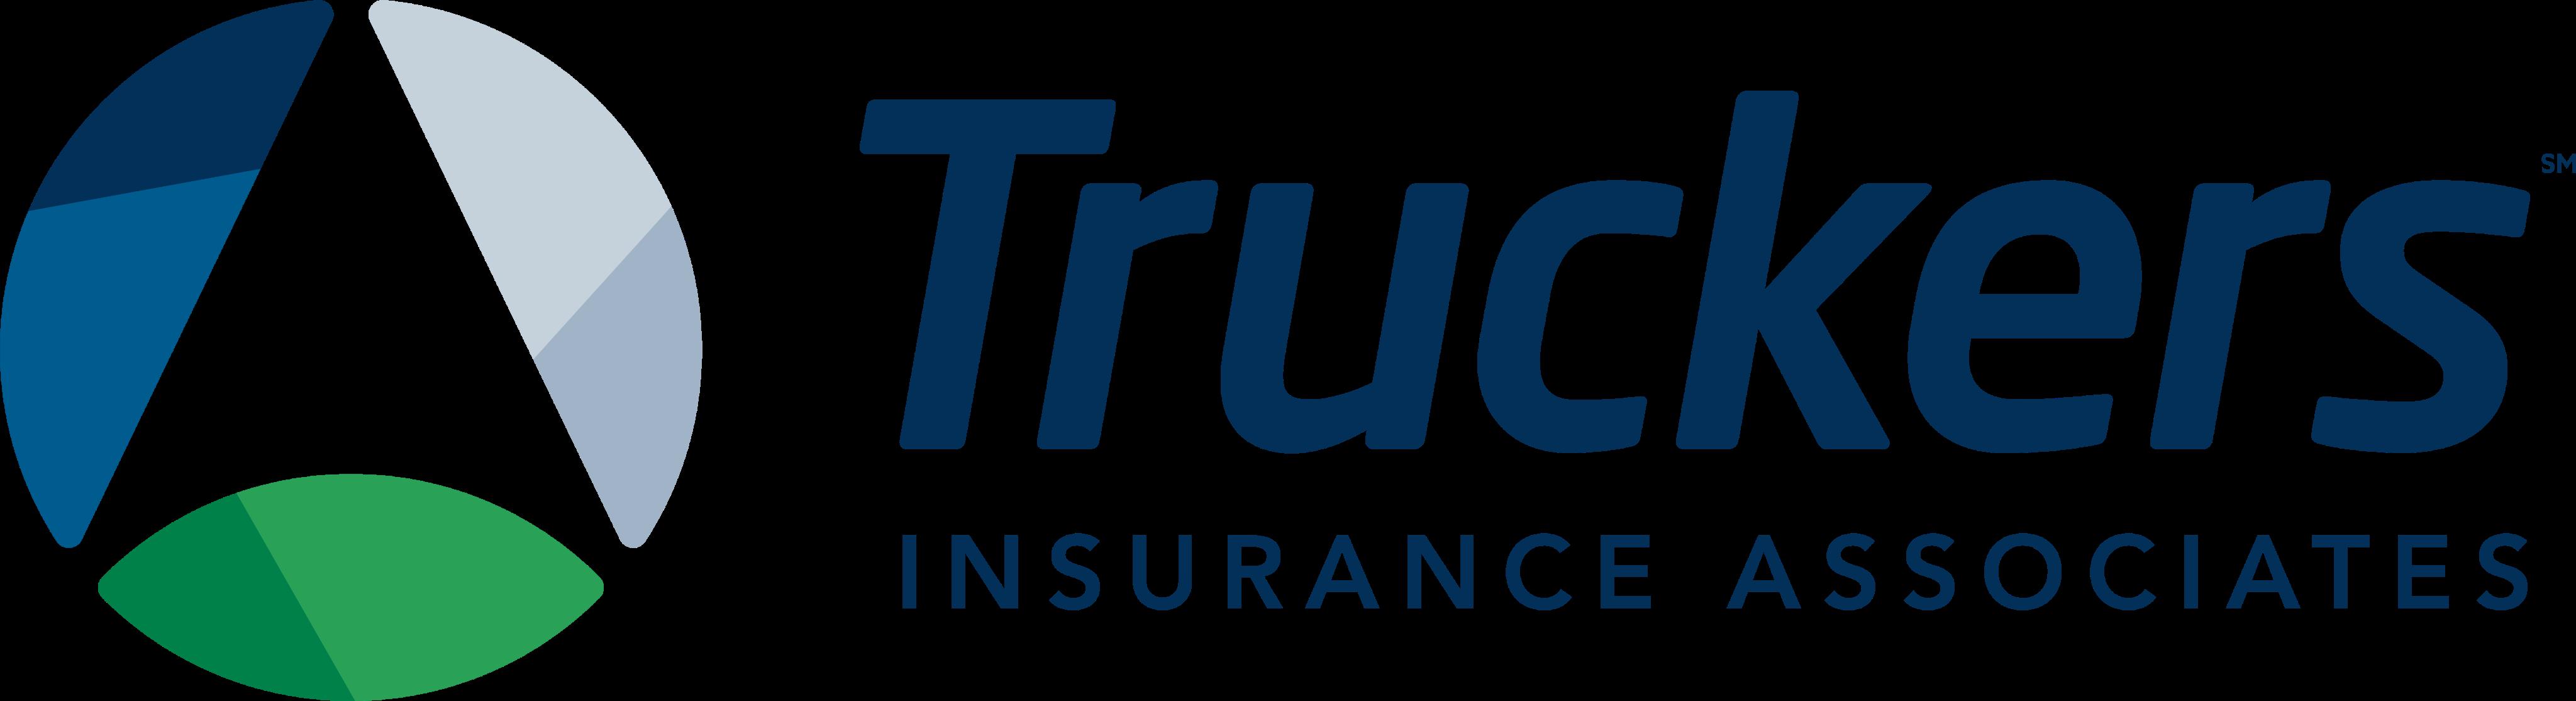 Iowa - Truckers Insurance Associates